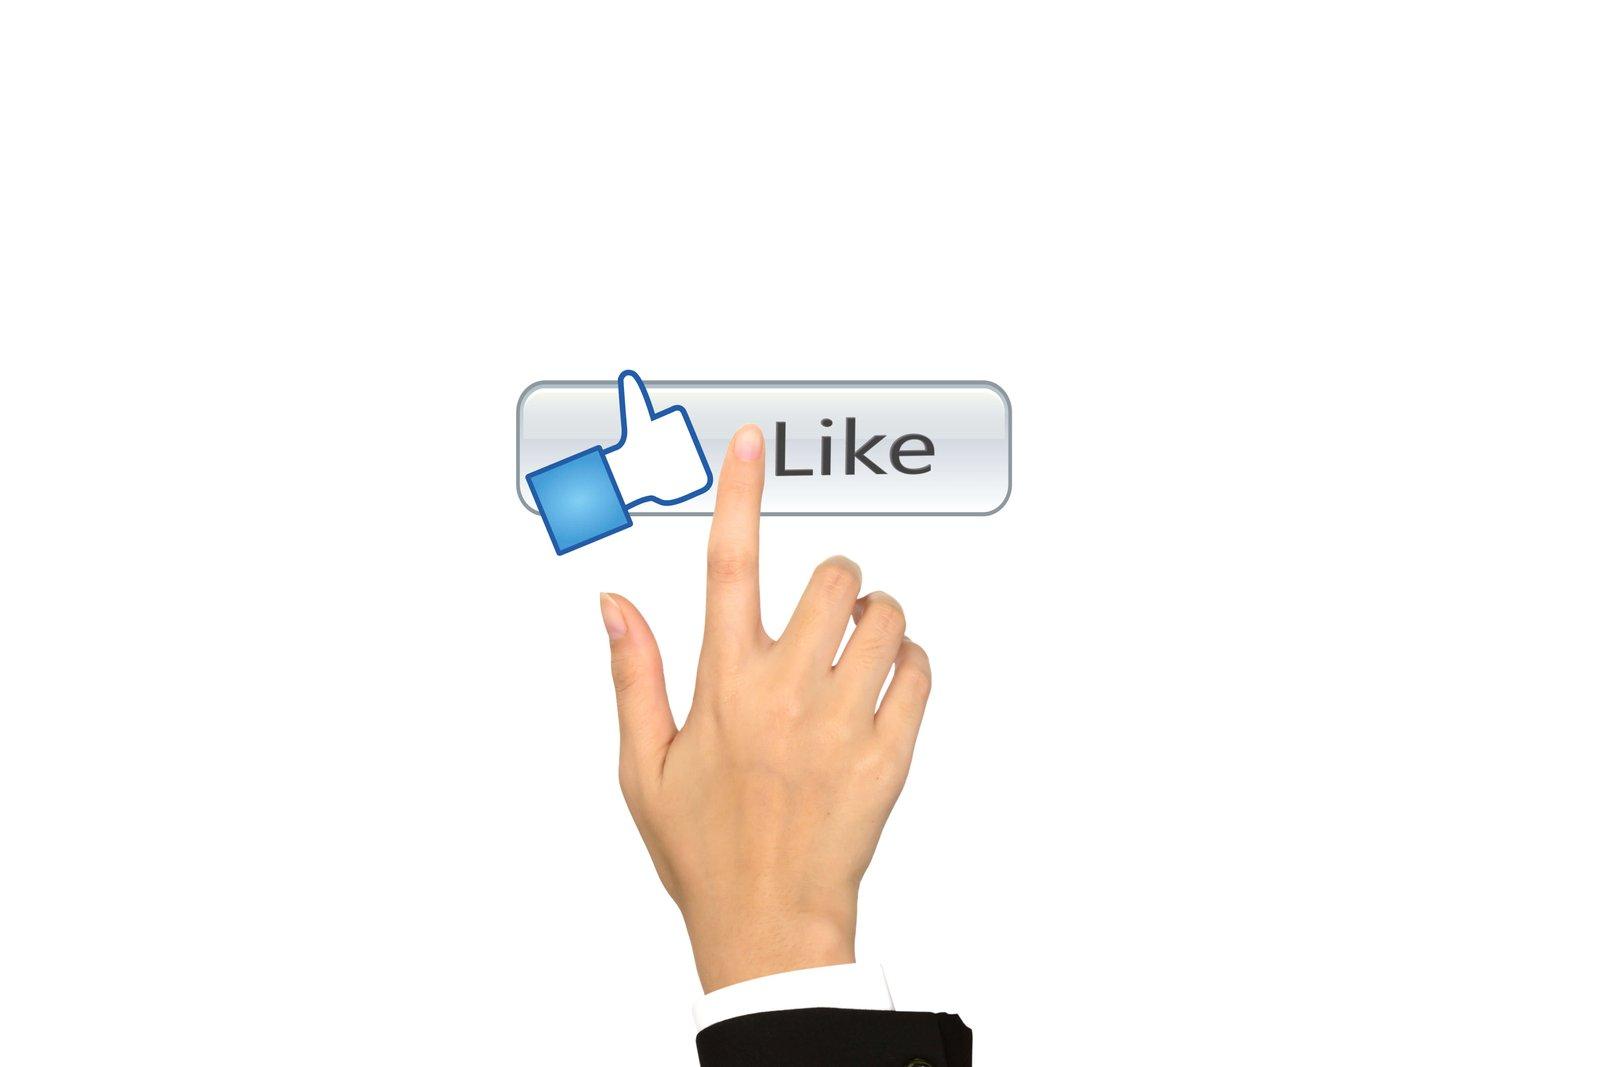 Curtidas ocultas no Facebook: Novo teste nos posts da rede social